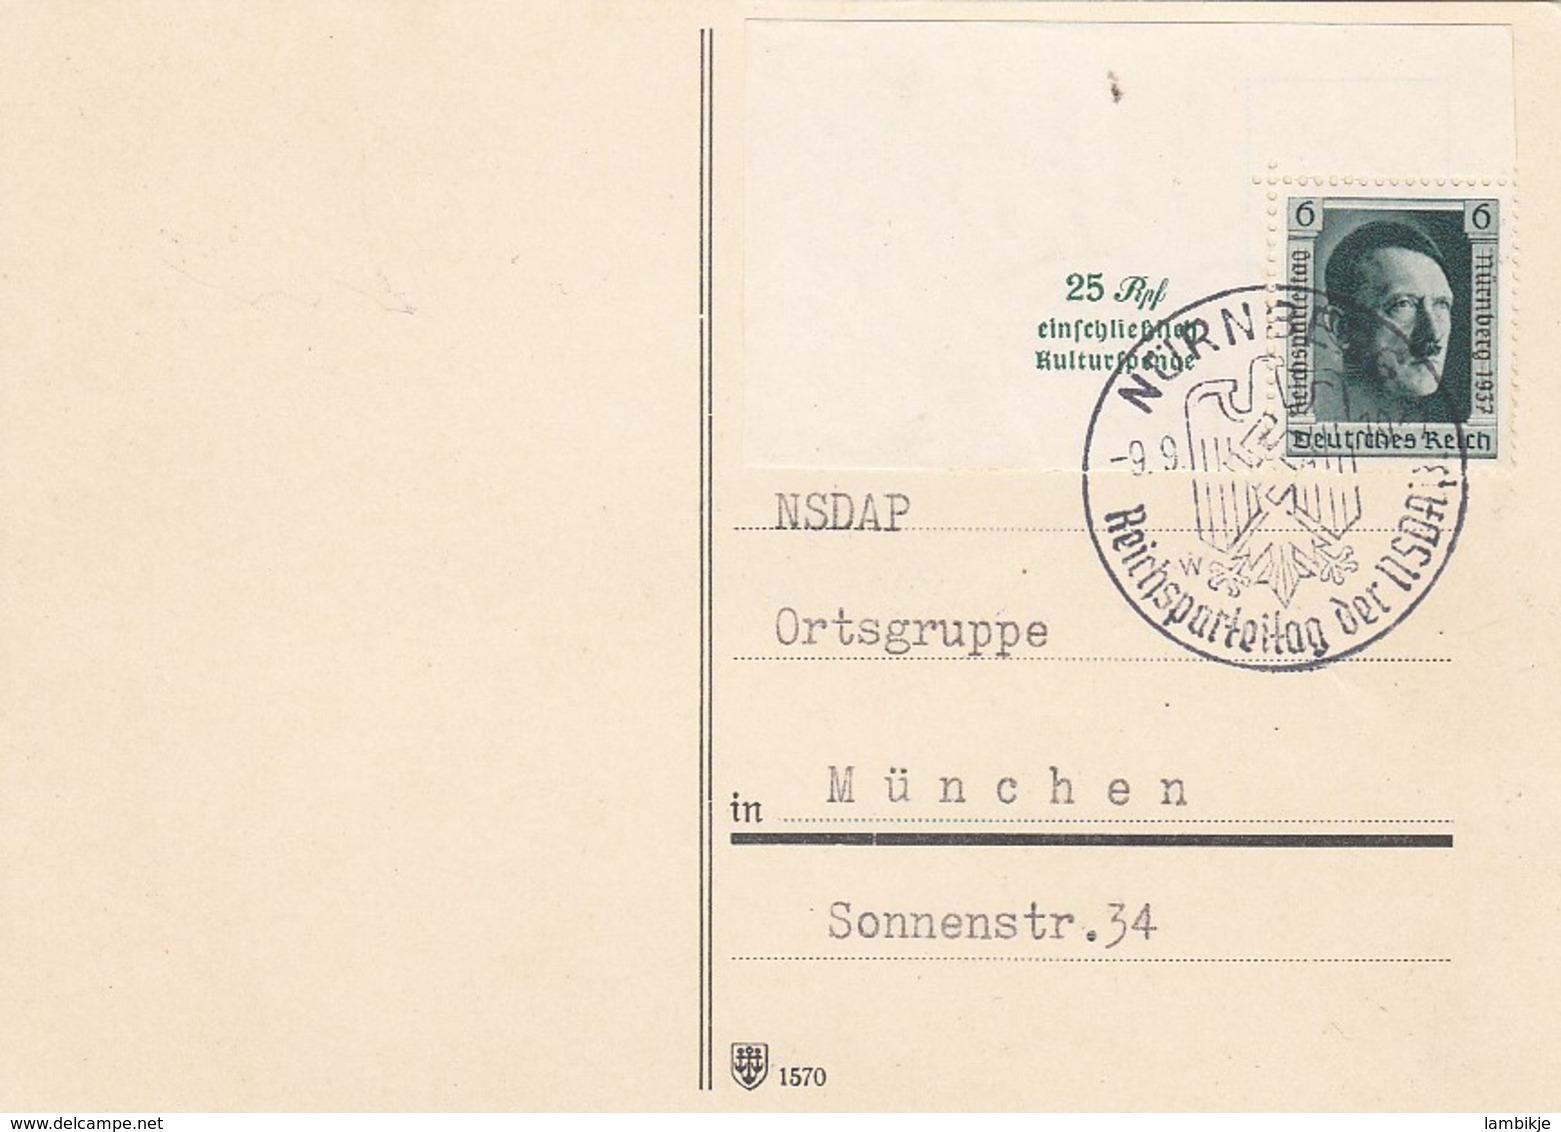 Deutsches Reich Propaganda Postkarte 1937 - Briefe U. Dokumente